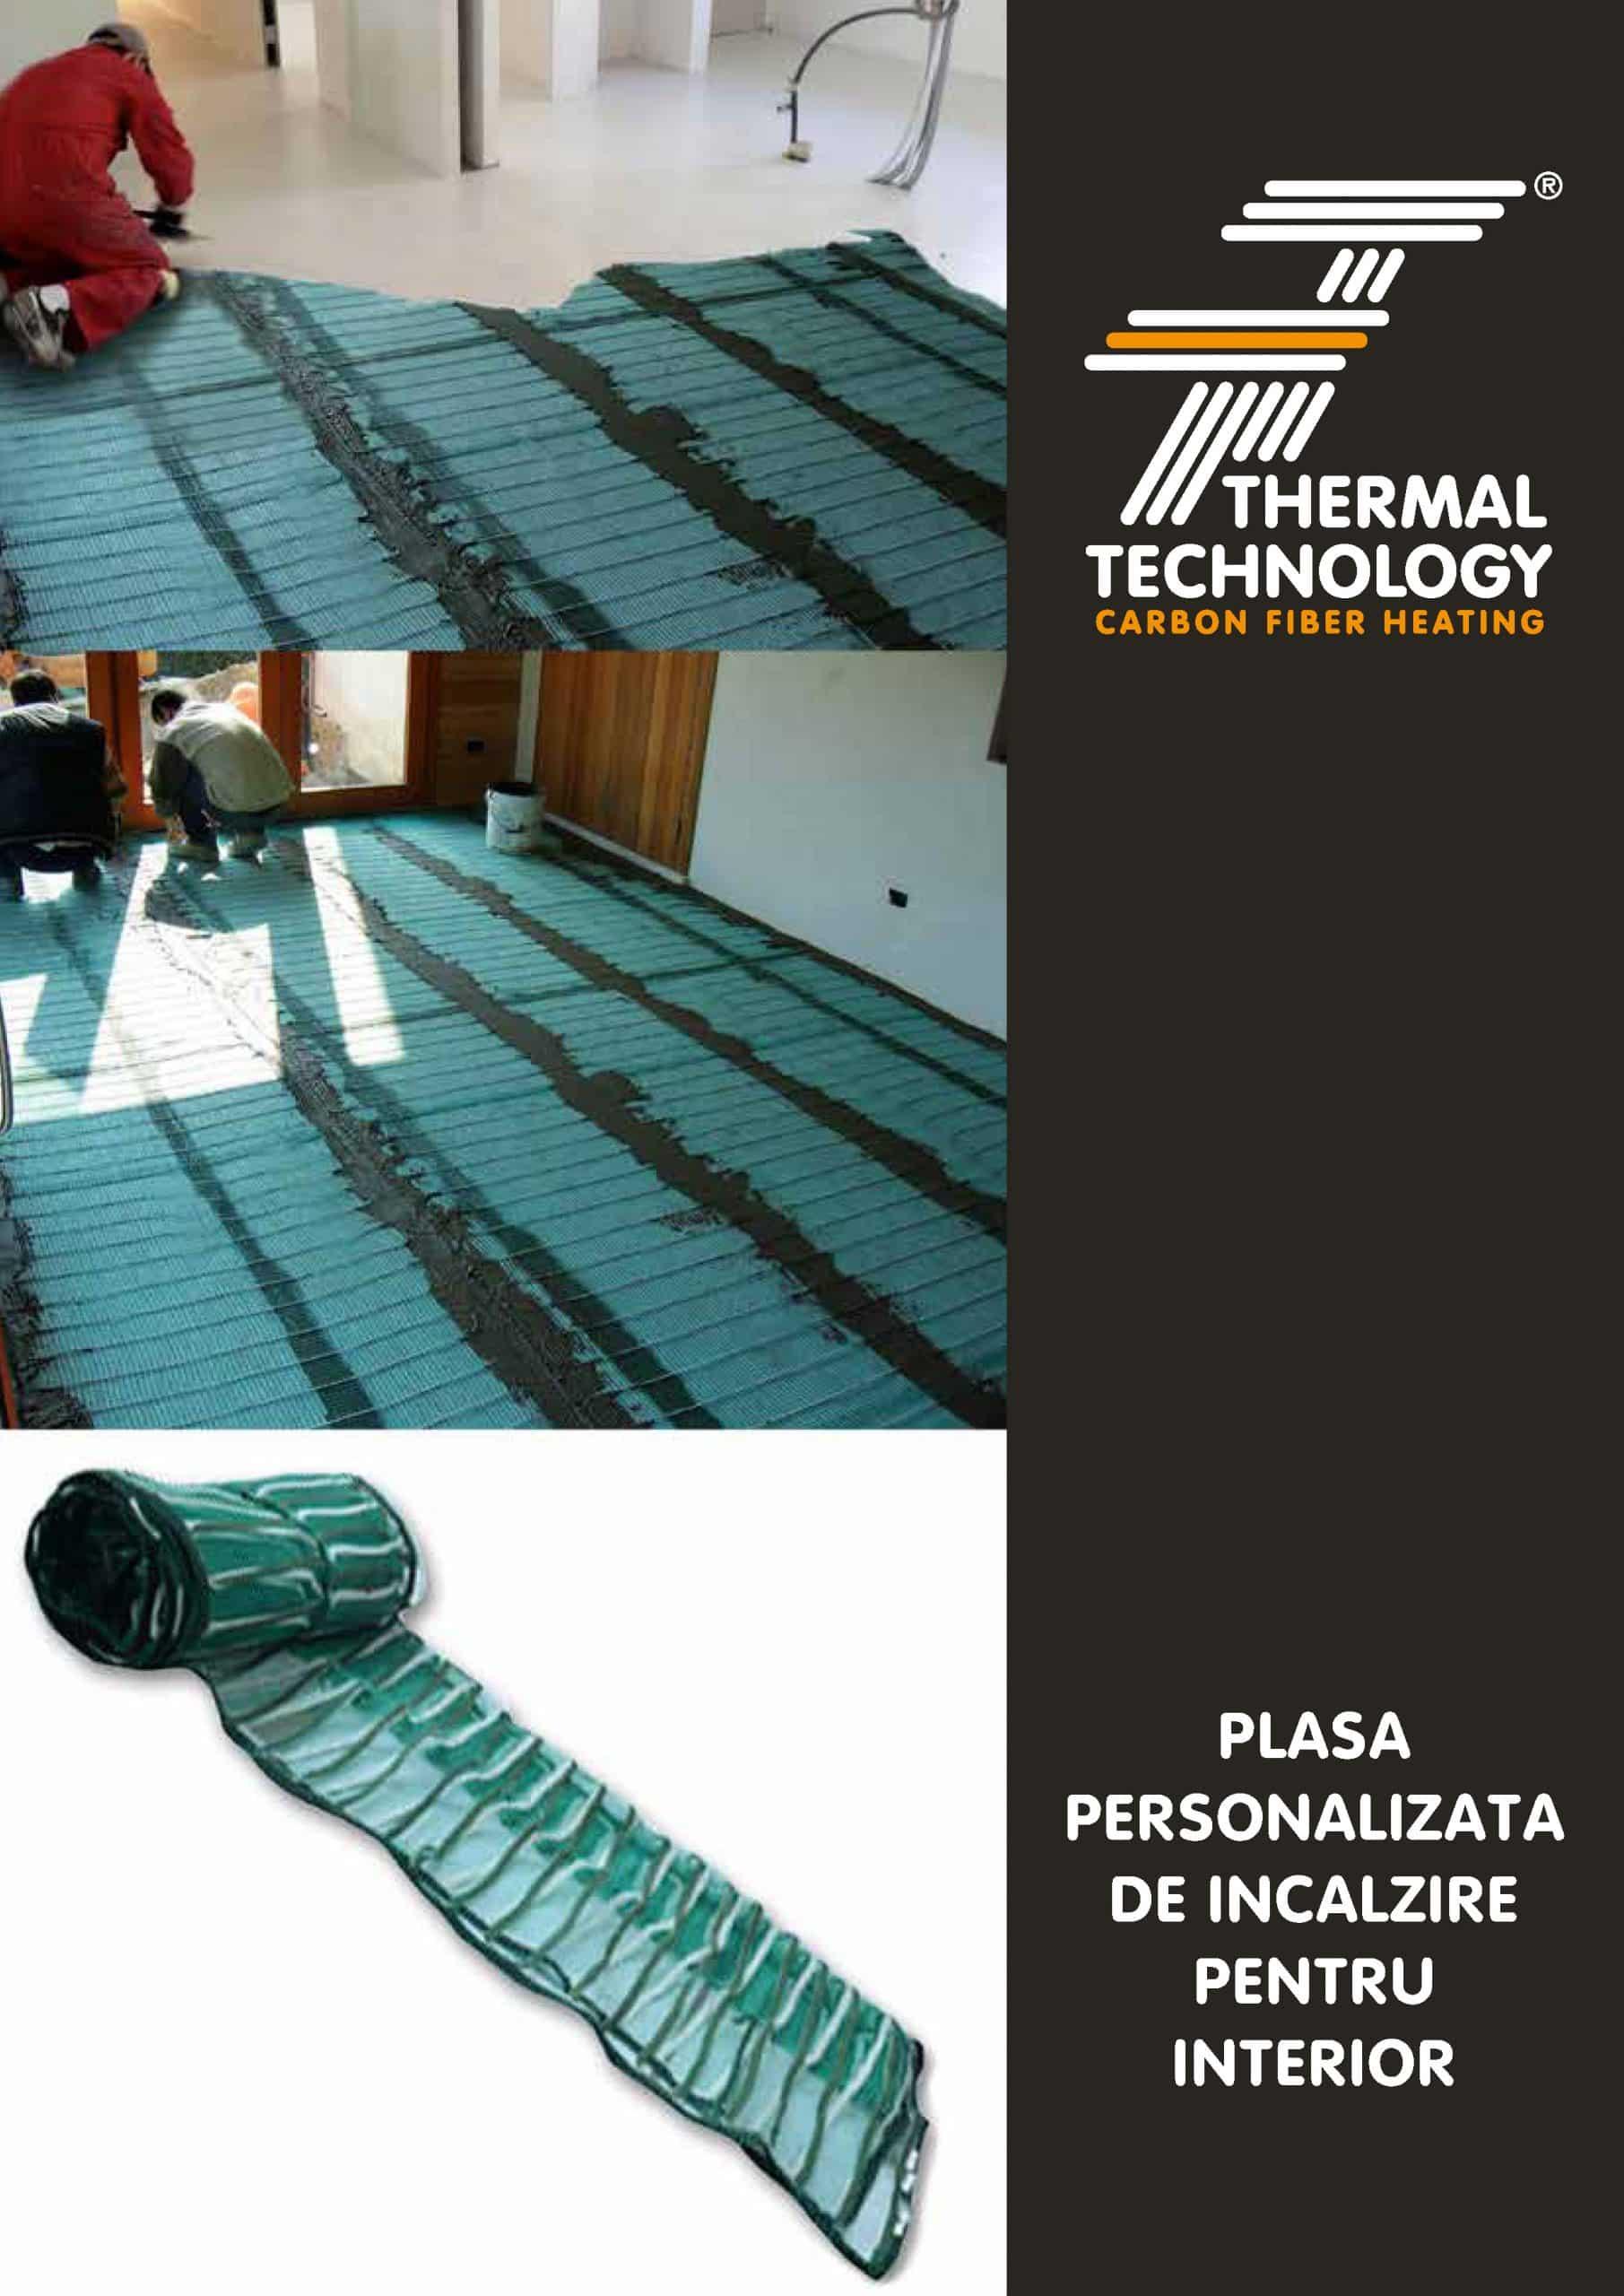 https://thermaltechnology.ro/wp-content/uploads/2020/03/PVRI_RO_Plasa-Personalizata-de-incalzire-pentru-interior_Page_1-scaled.jpg